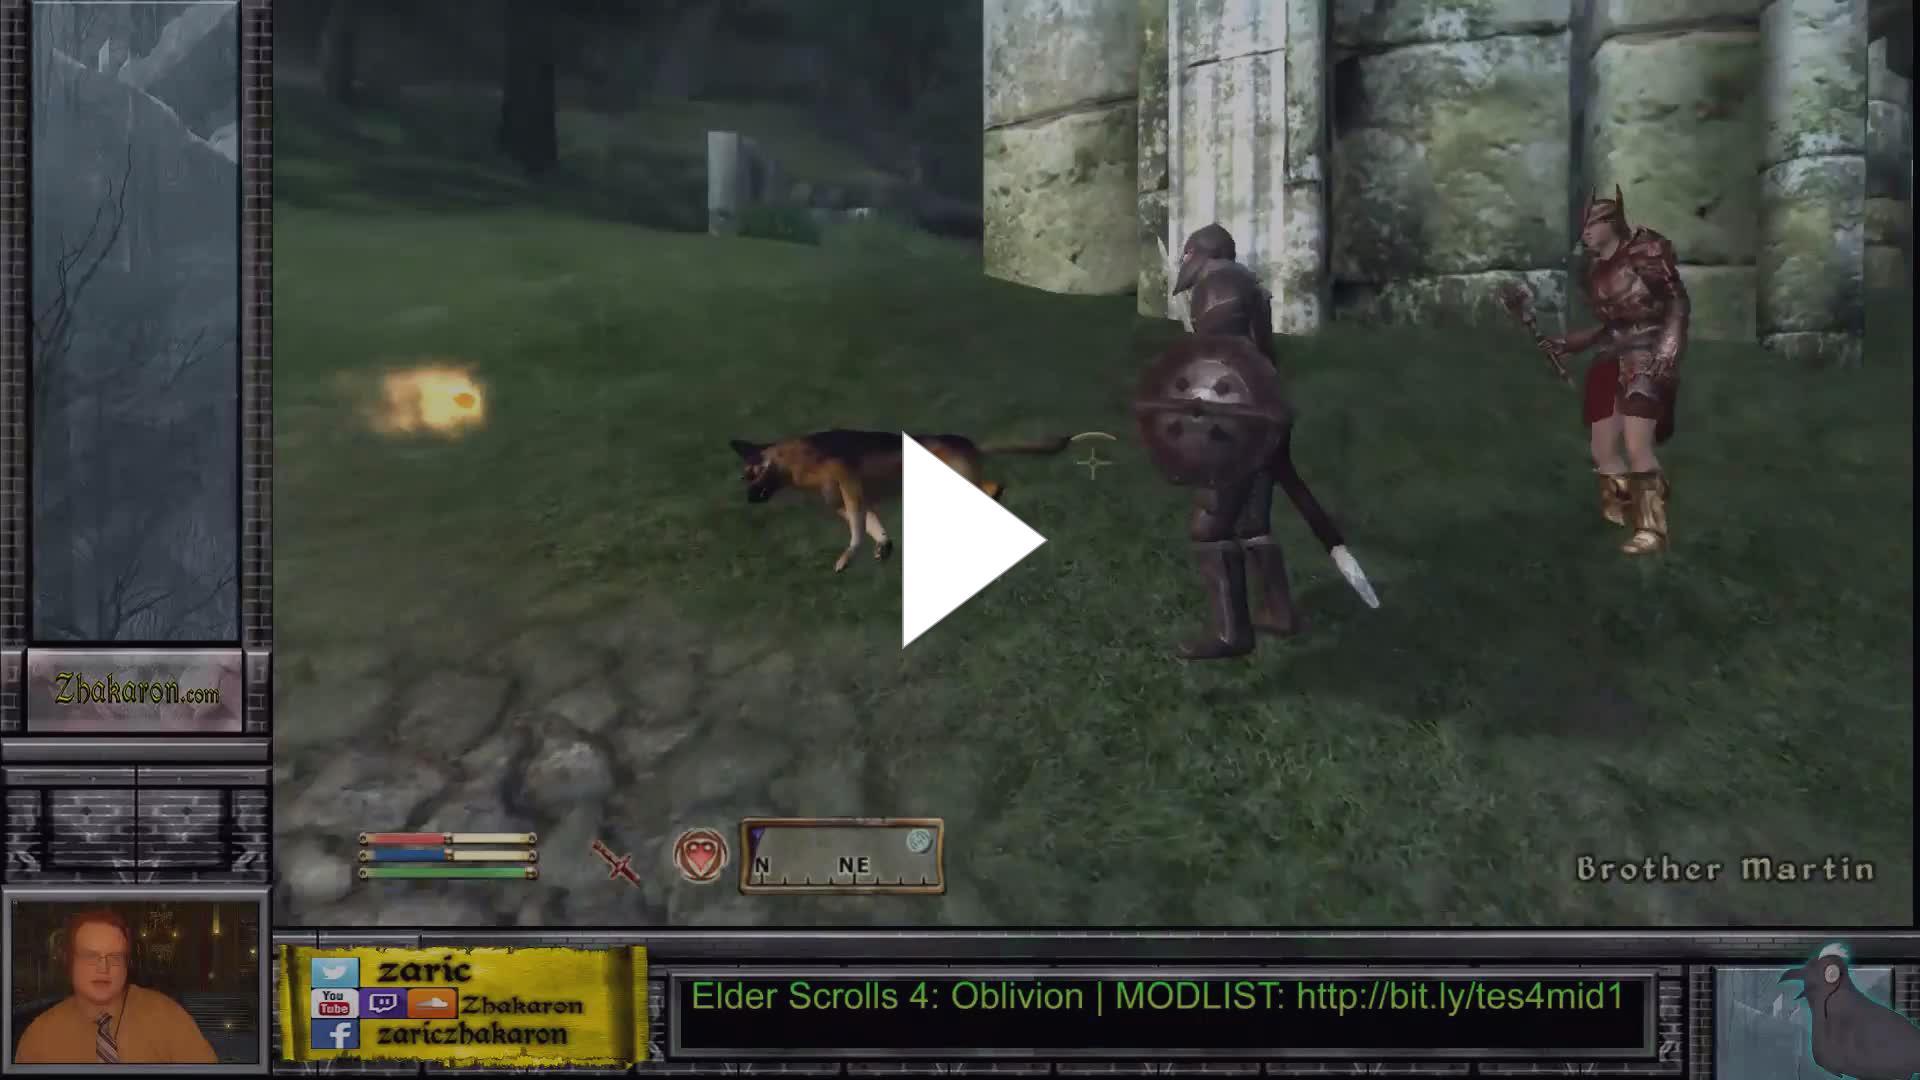 Oblivion AI - Twitch